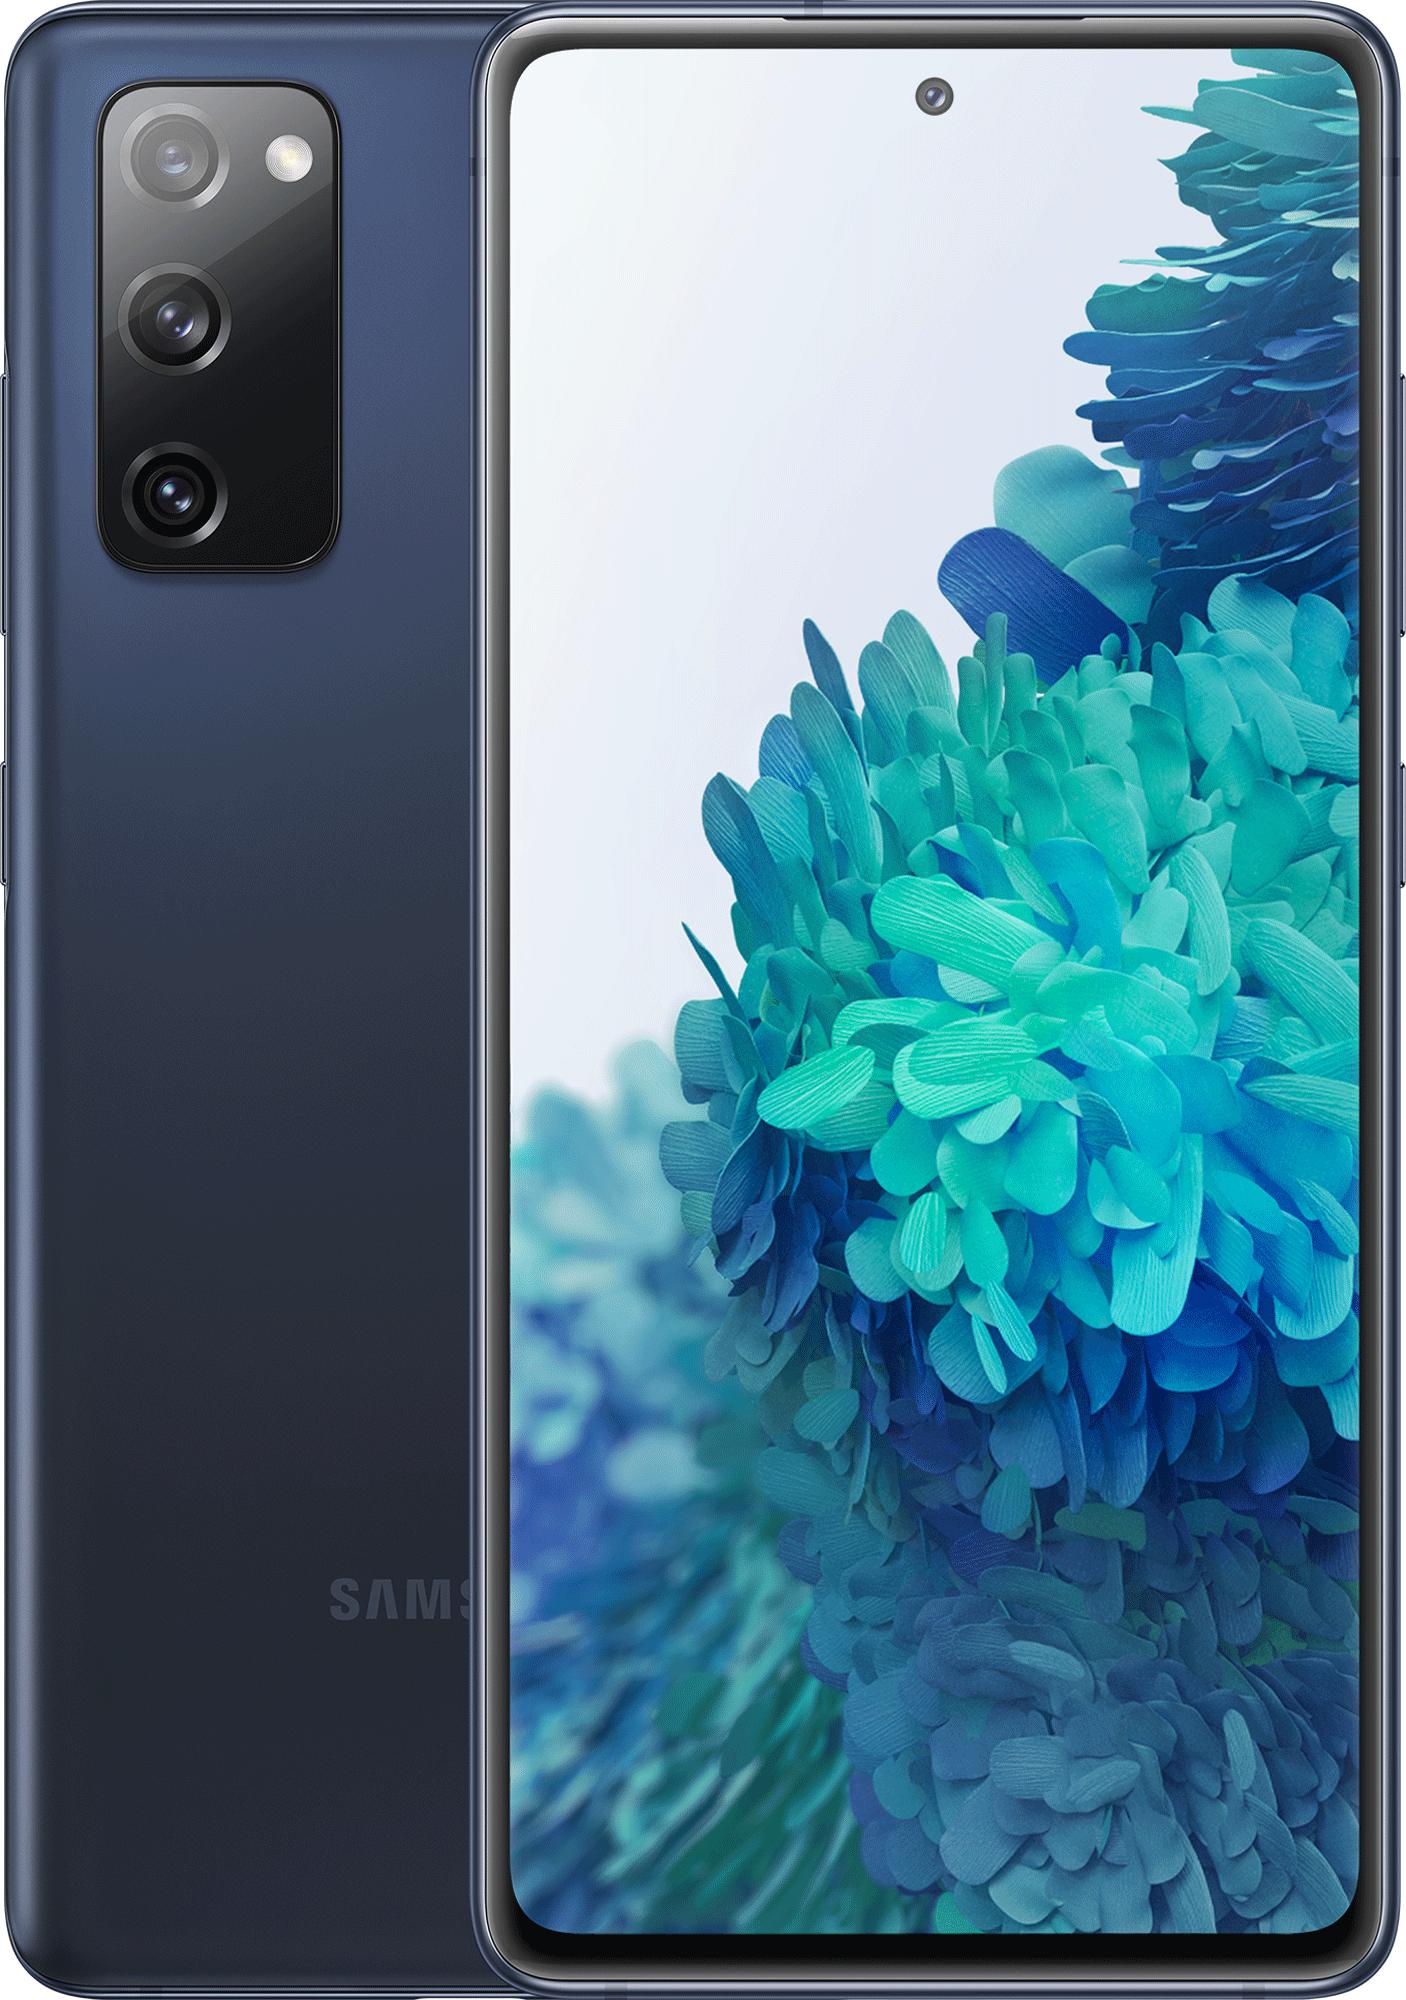 SAMSUNG Galaxy S20 FE – 128 GB Donkerblauw